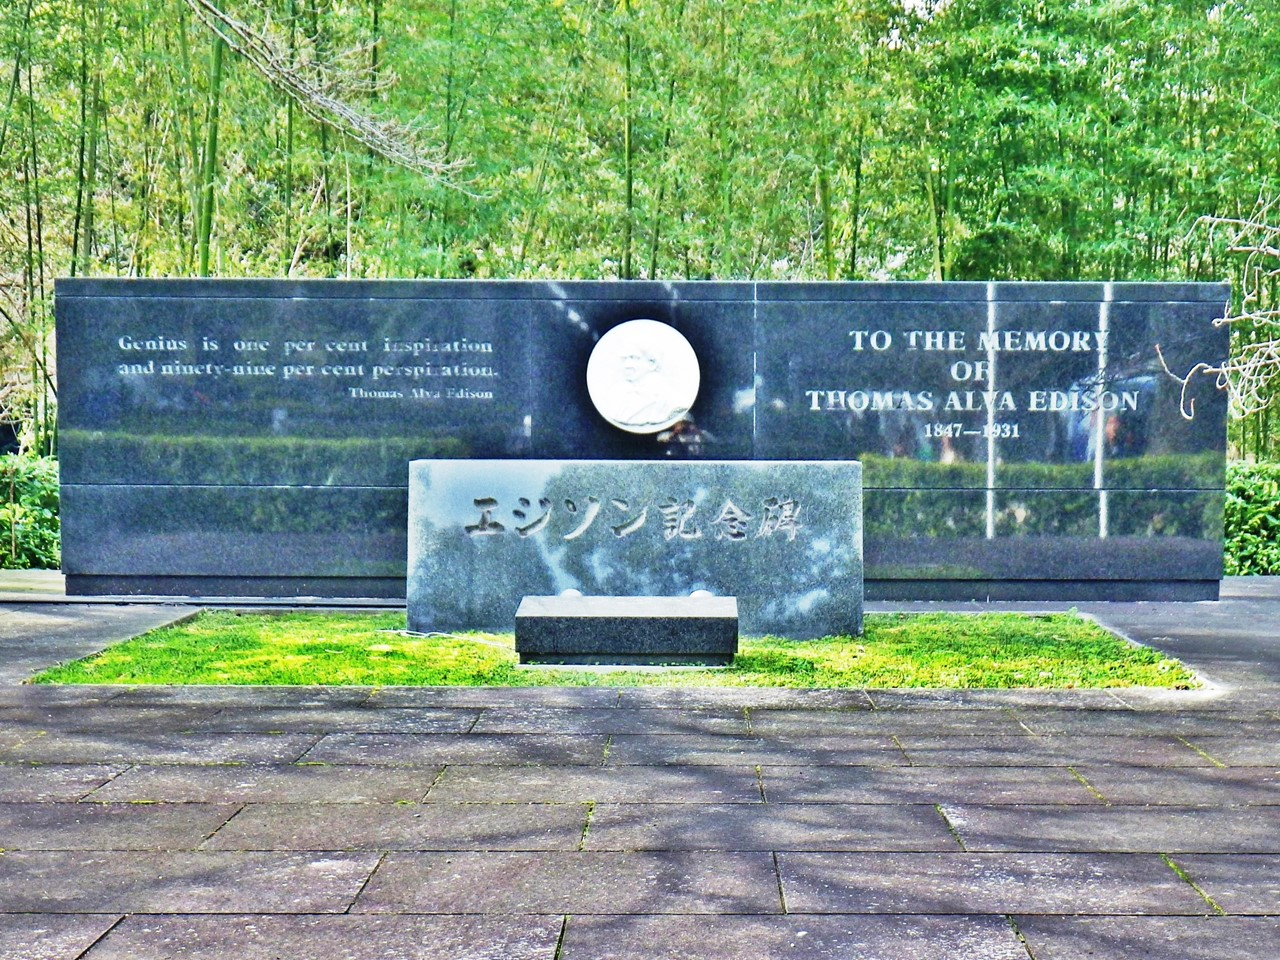 16b エジソン記念碑